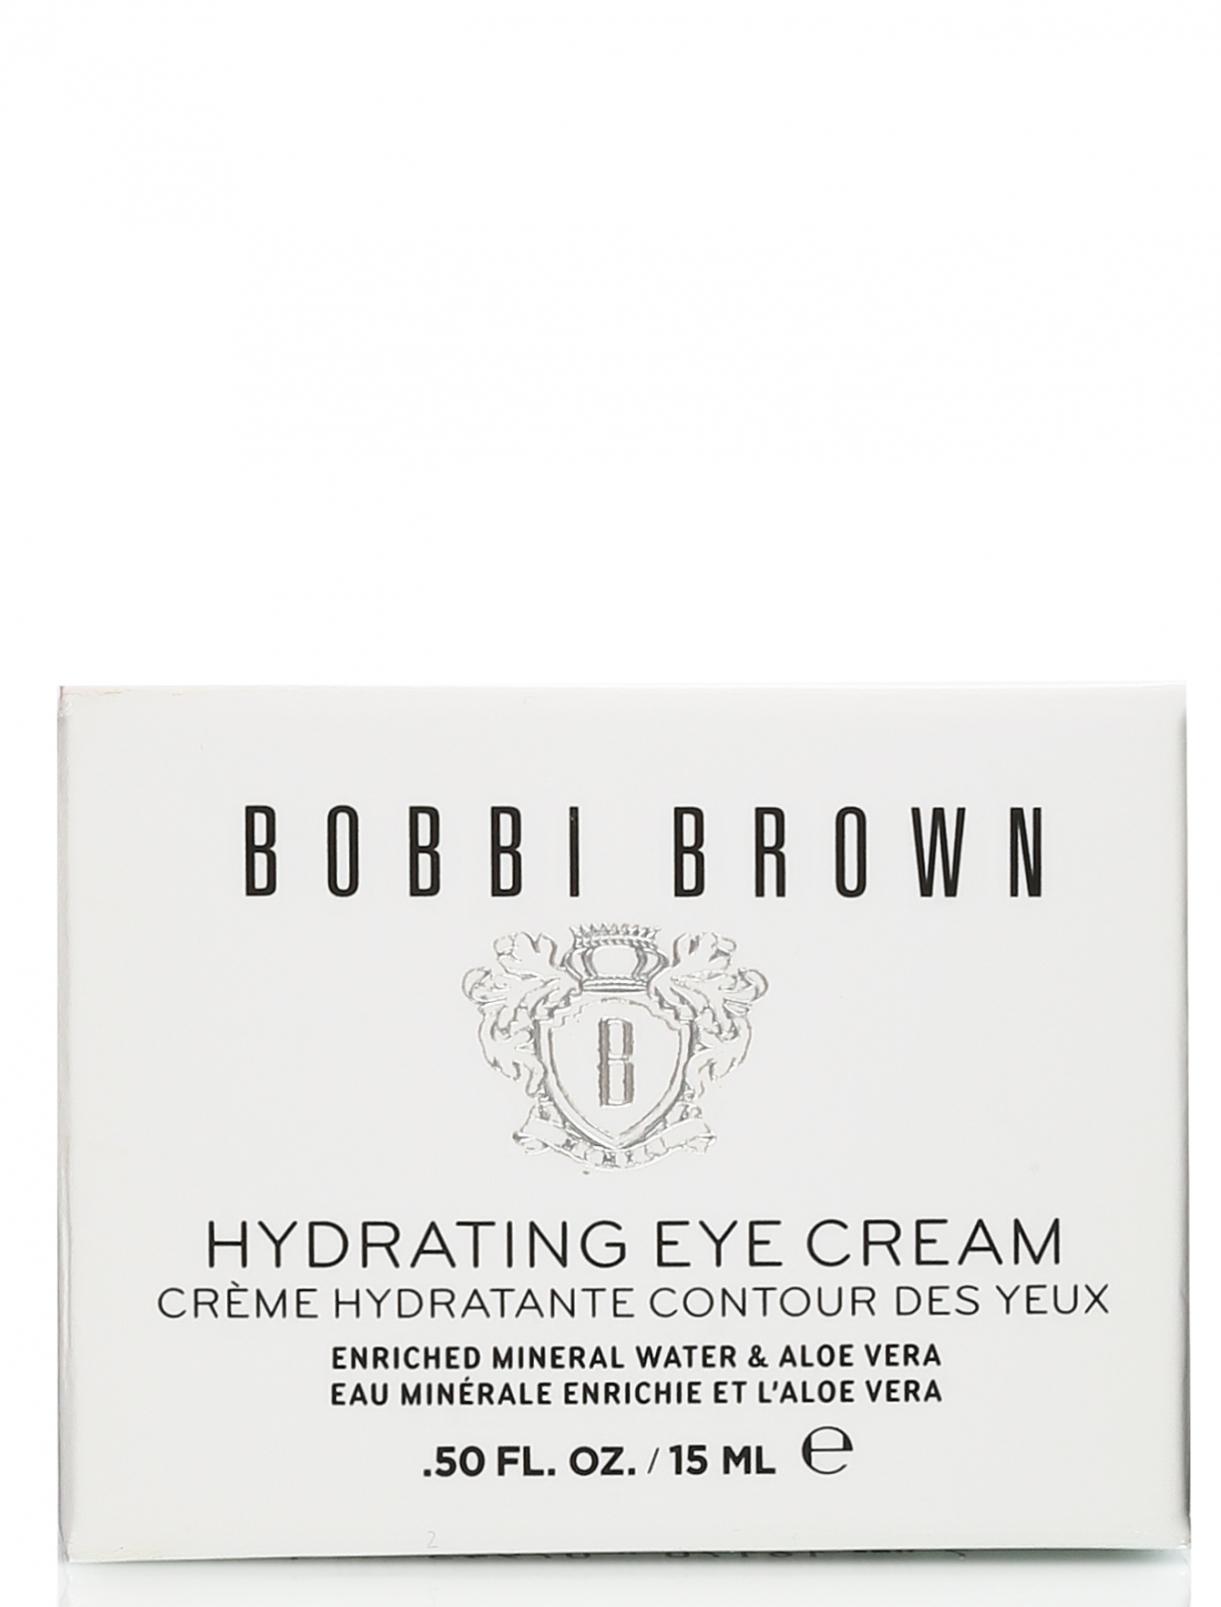 Увлажняющий крем для области вокруг глаз - Skin Care, 15ml Bobbi Brown  –  Модель Общий вид